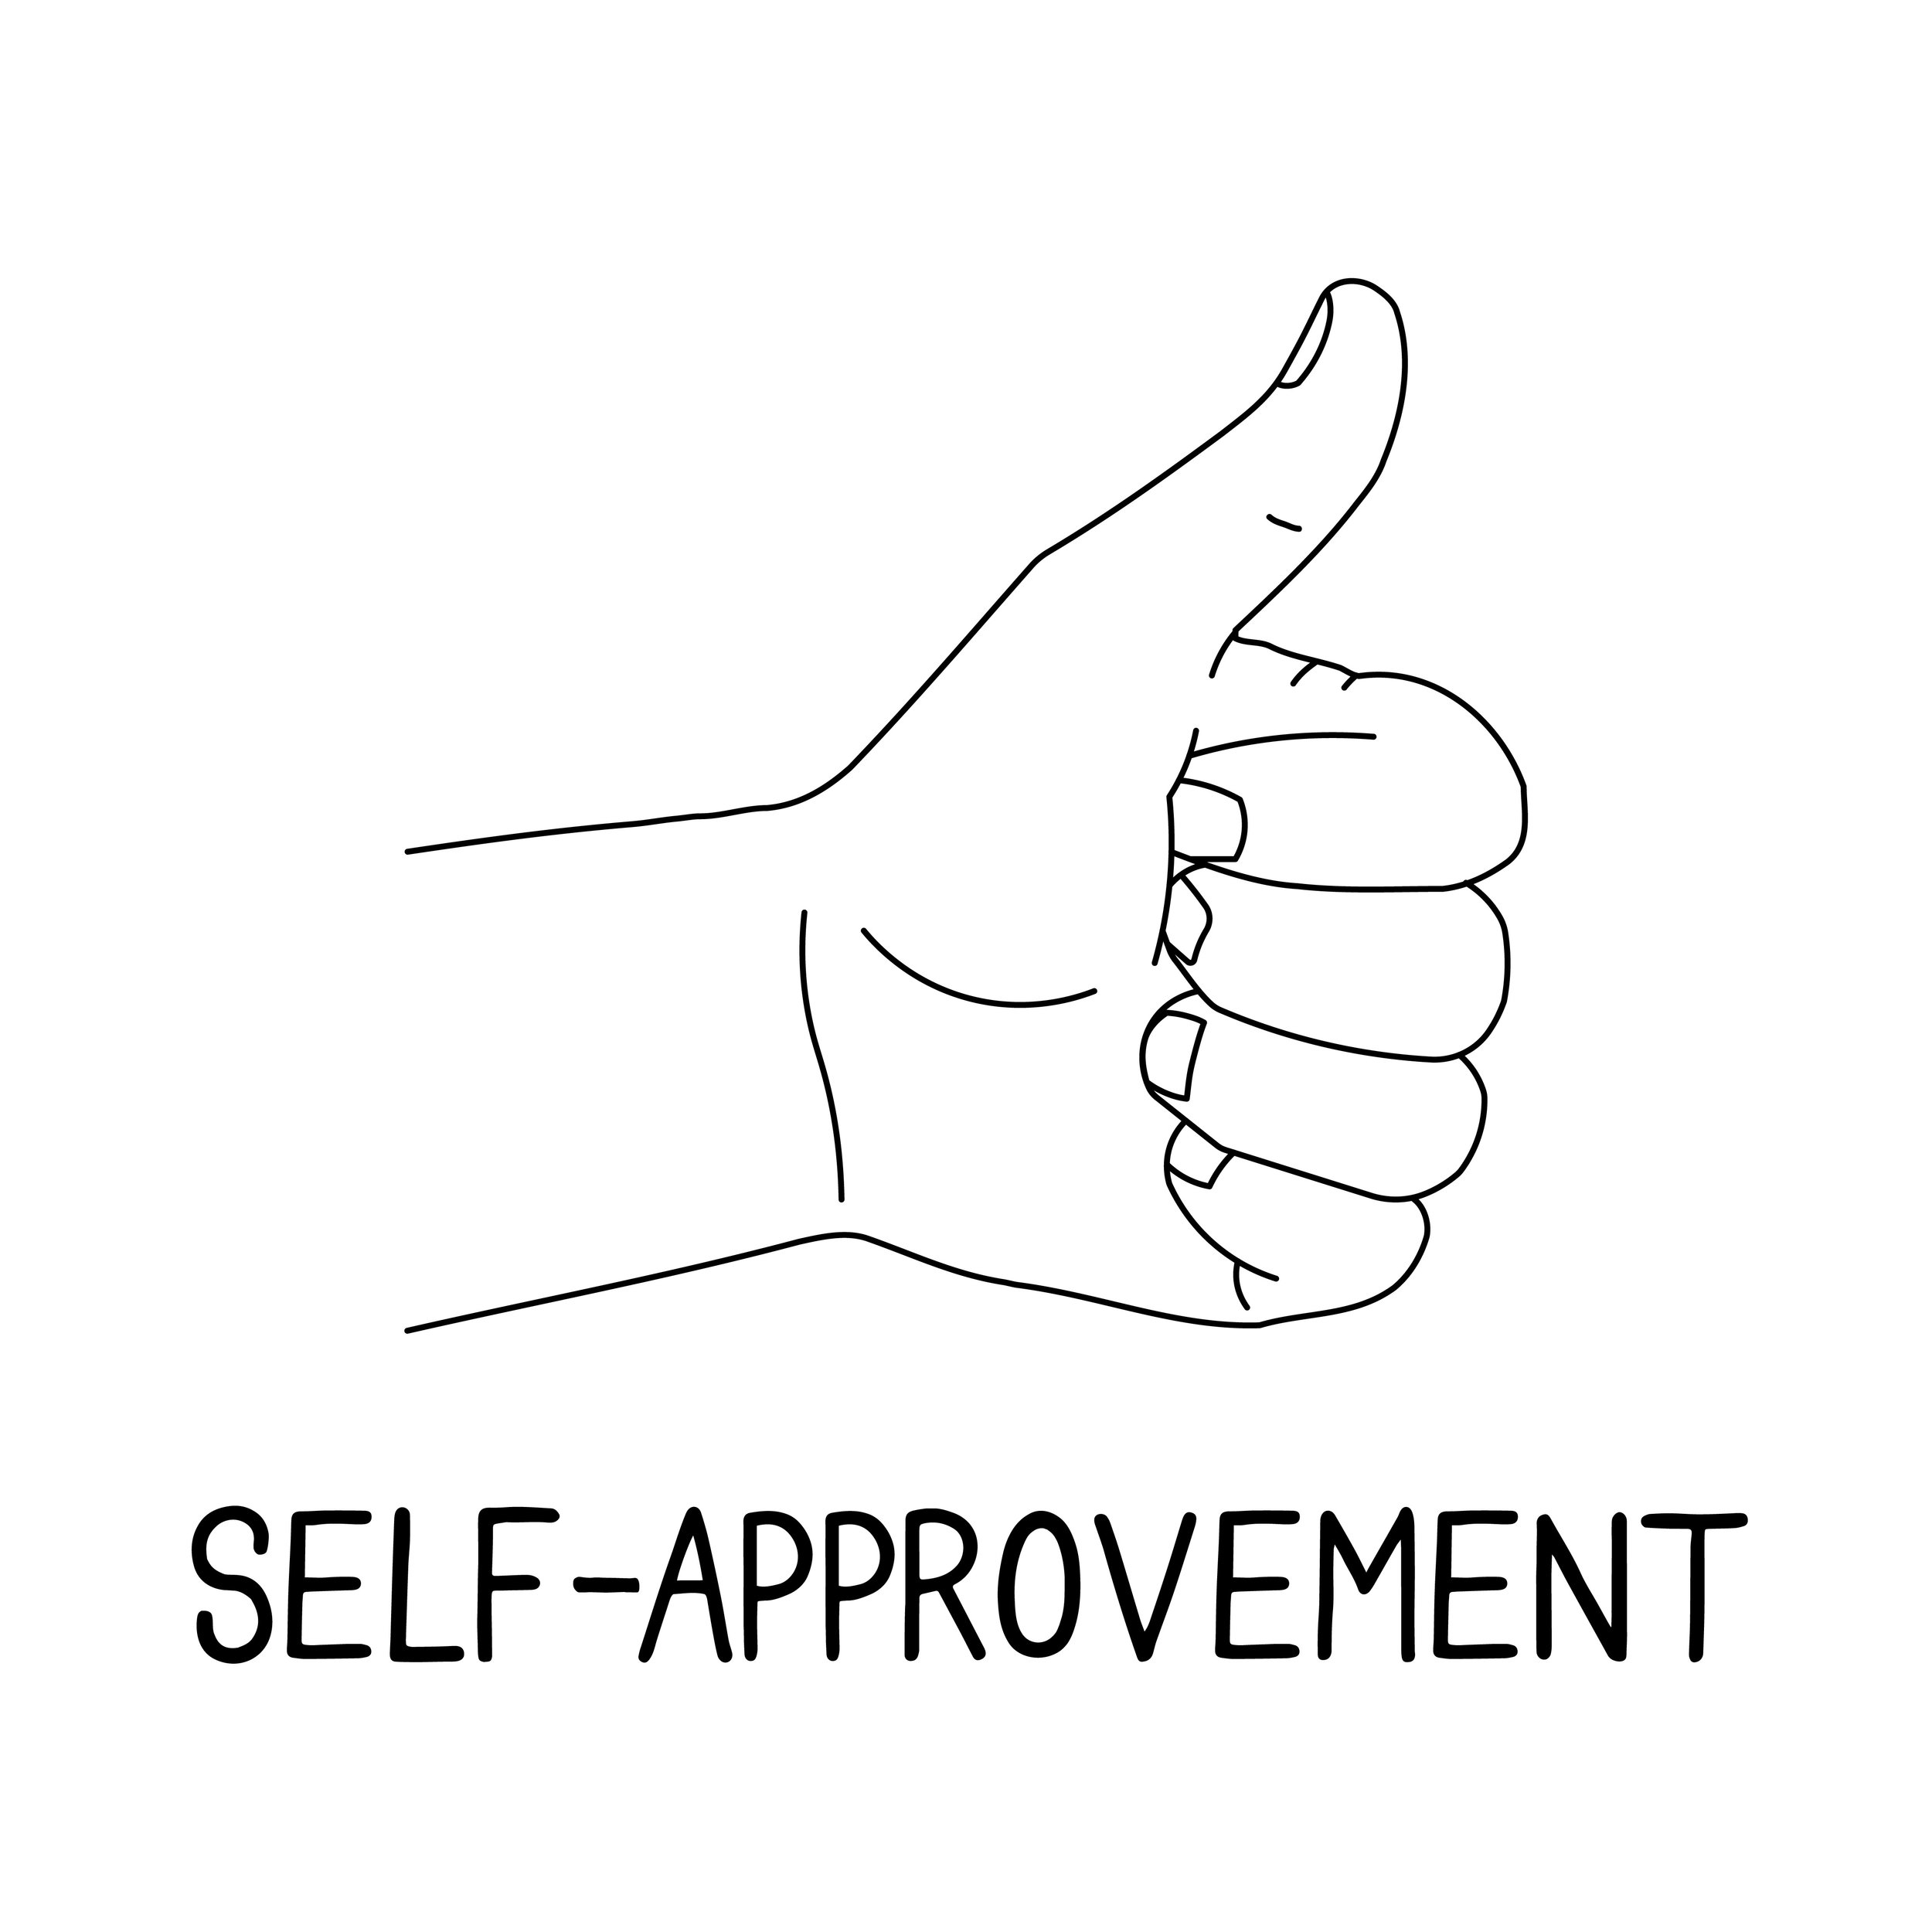 selfapprovement-01.jpg